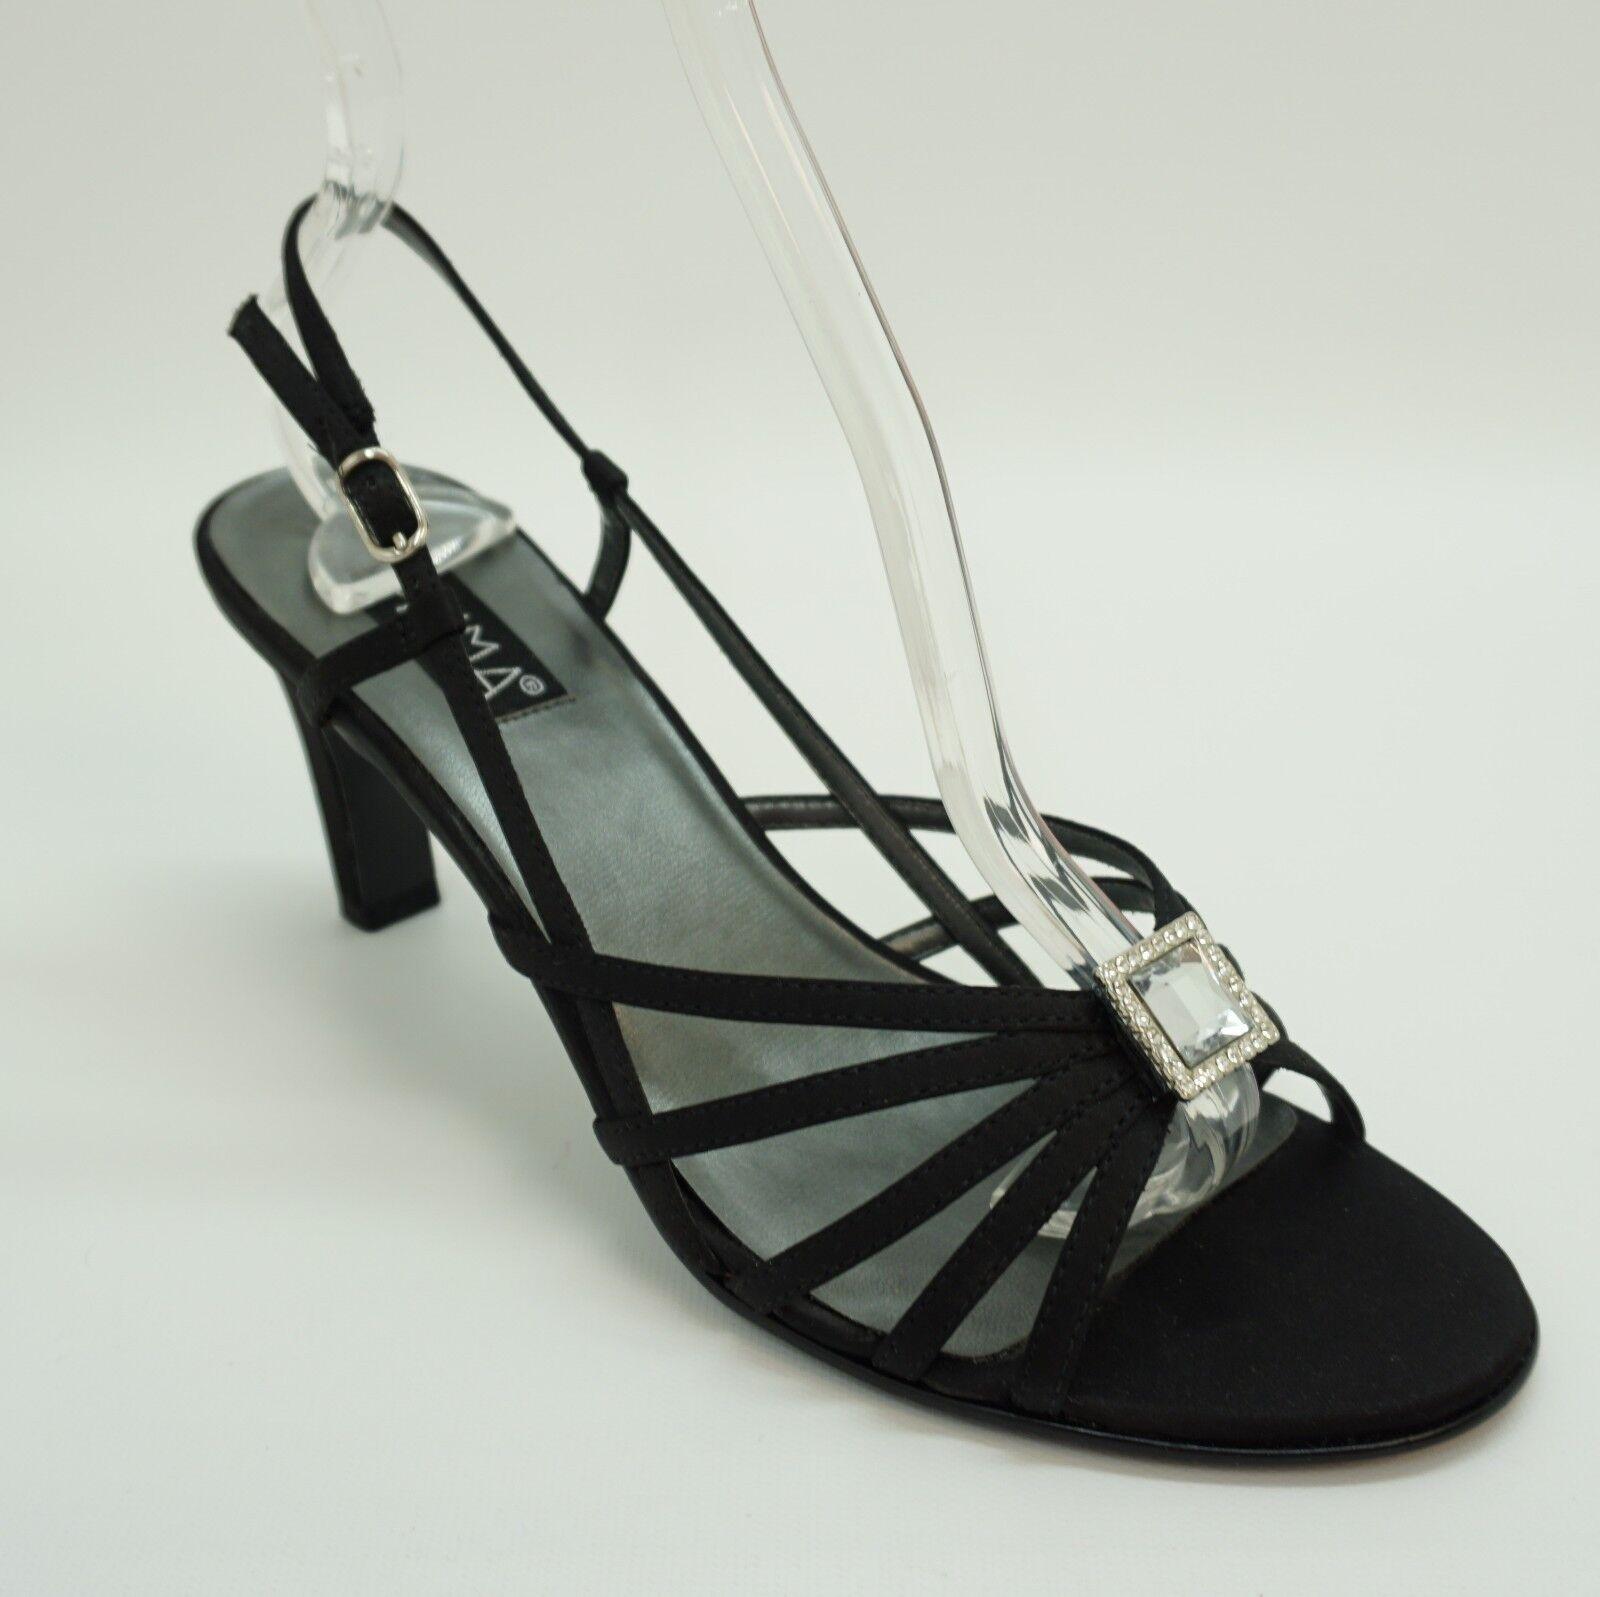 Prima Women Shoe Liza Open Toe Strappy Slingback Jewel High Heel Black Satin Jewel Slingback 7M 4234a1